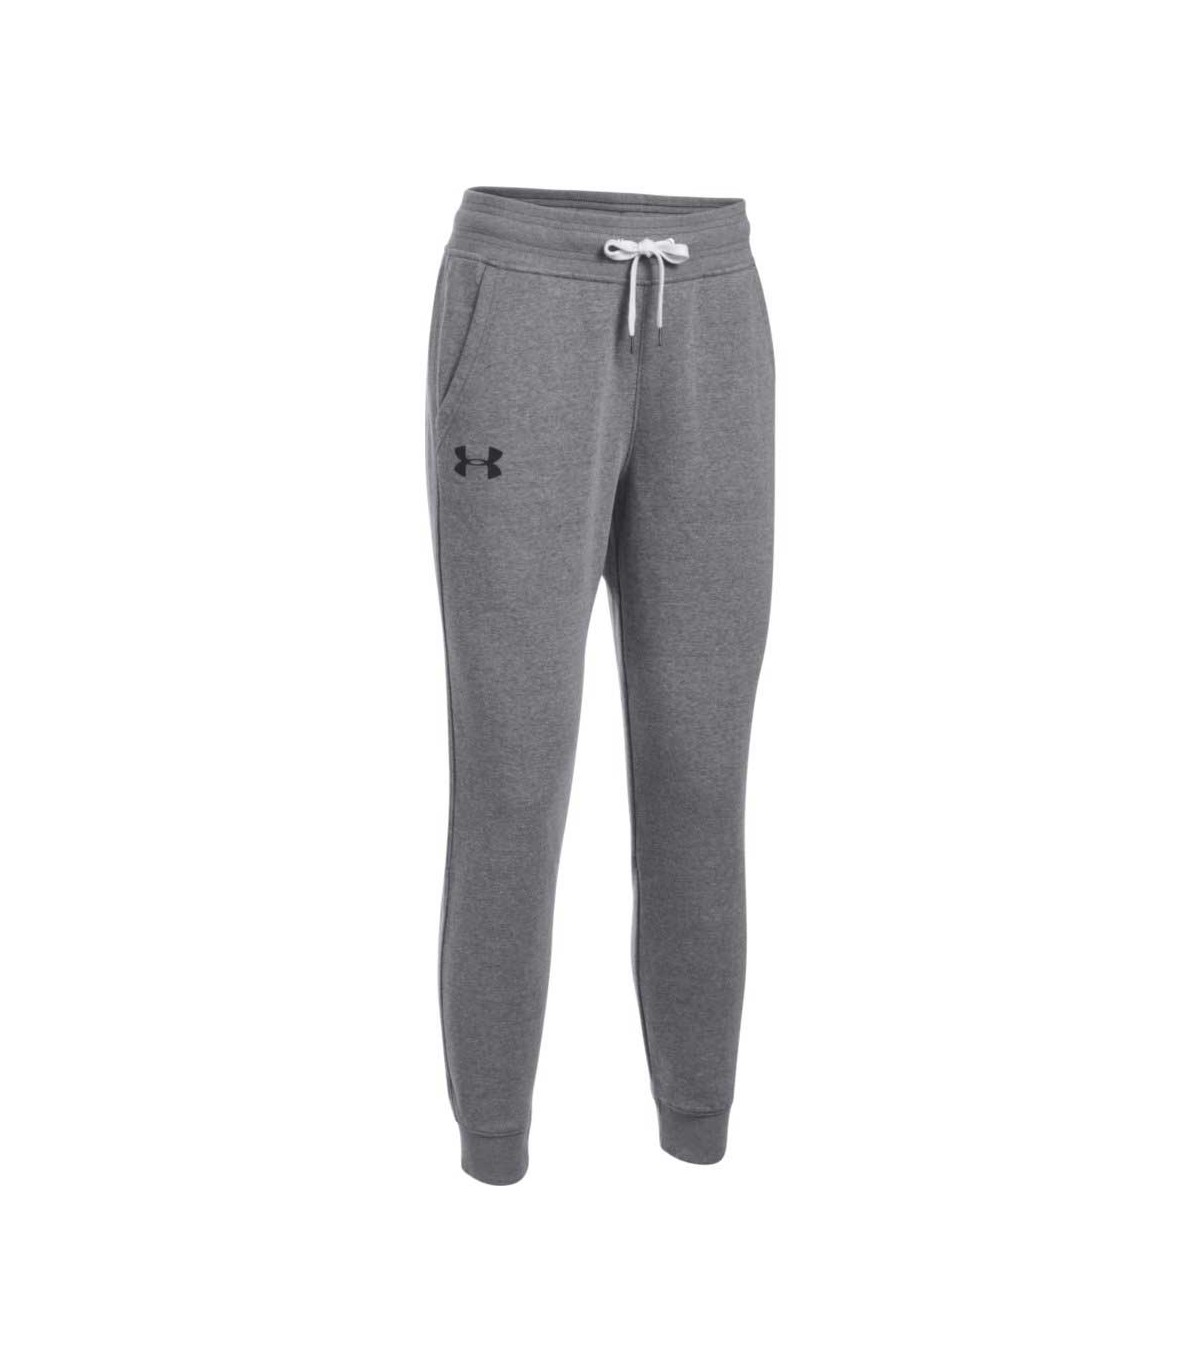 wholesale dealer 53bd5 b2174 Jogging femme - UA Favorite Fleece - Under Armour at shop Rugby-Cor.